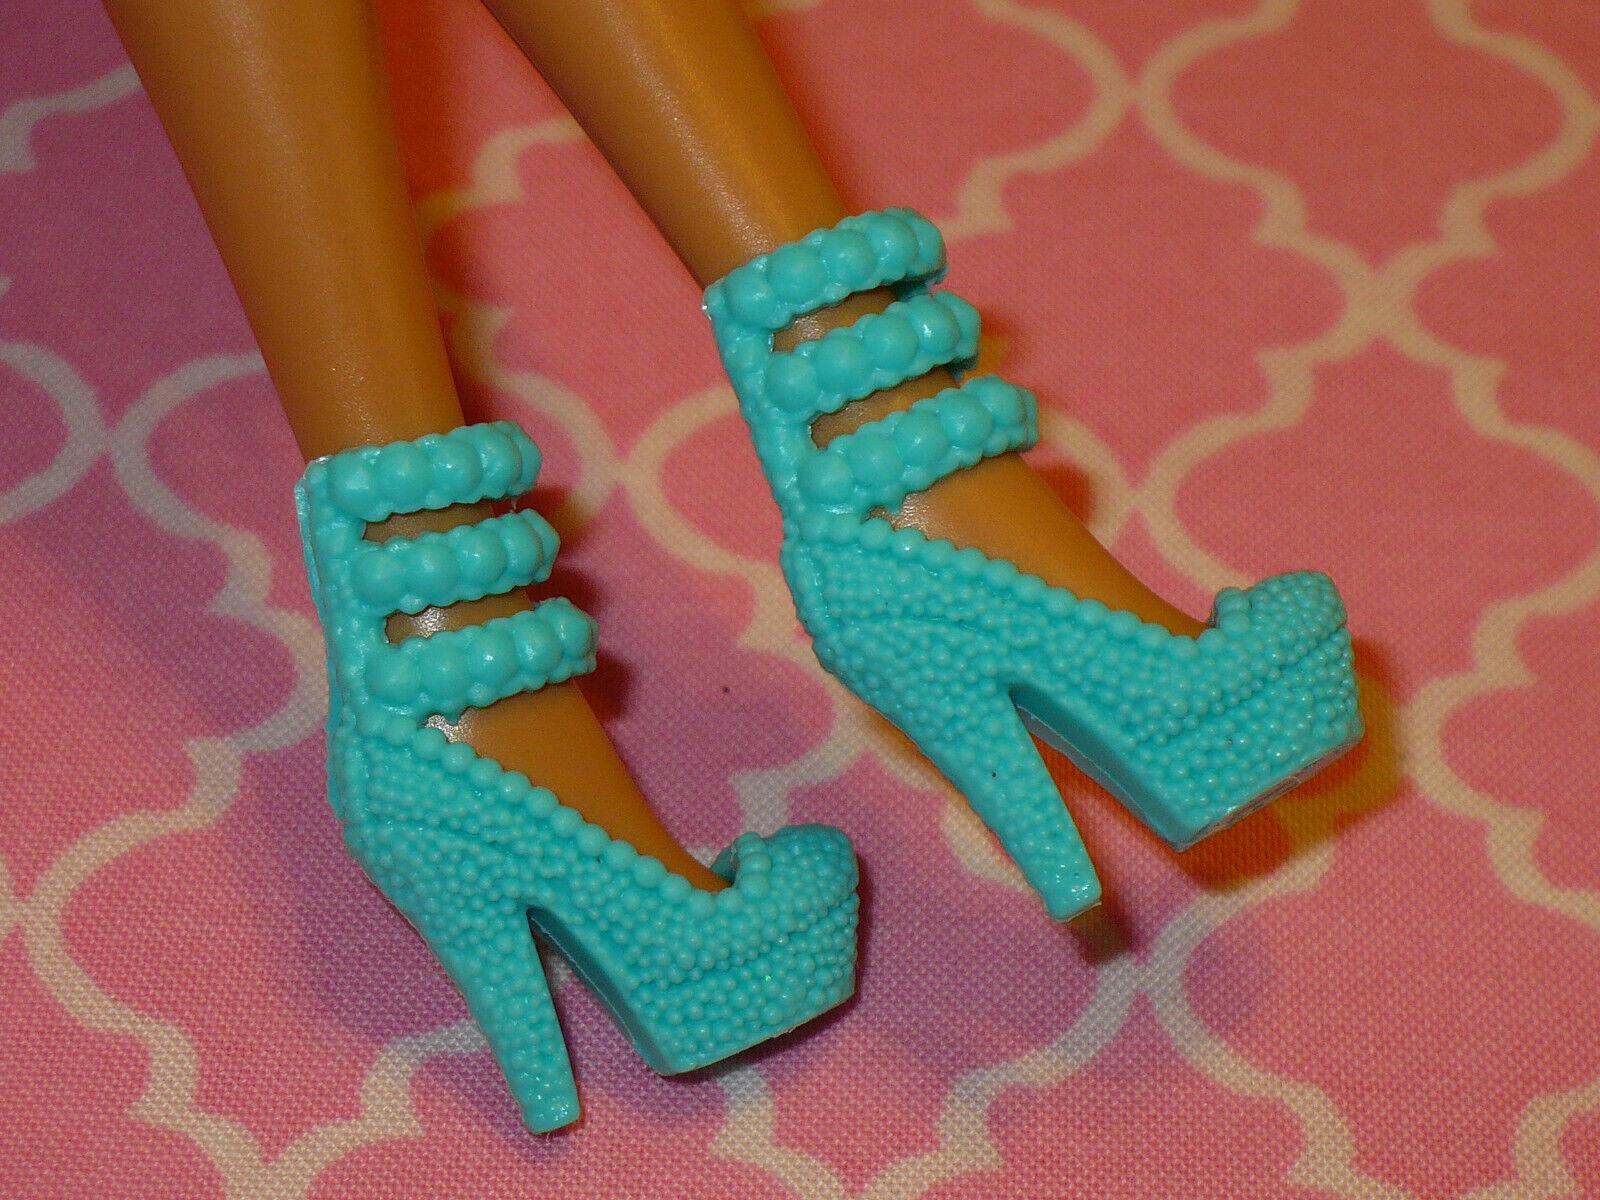 Mattel Barbie Doll Shoes FASHIONISTAS FASHION FEVER AQUA FANCY HIGH HEELS - $10.39